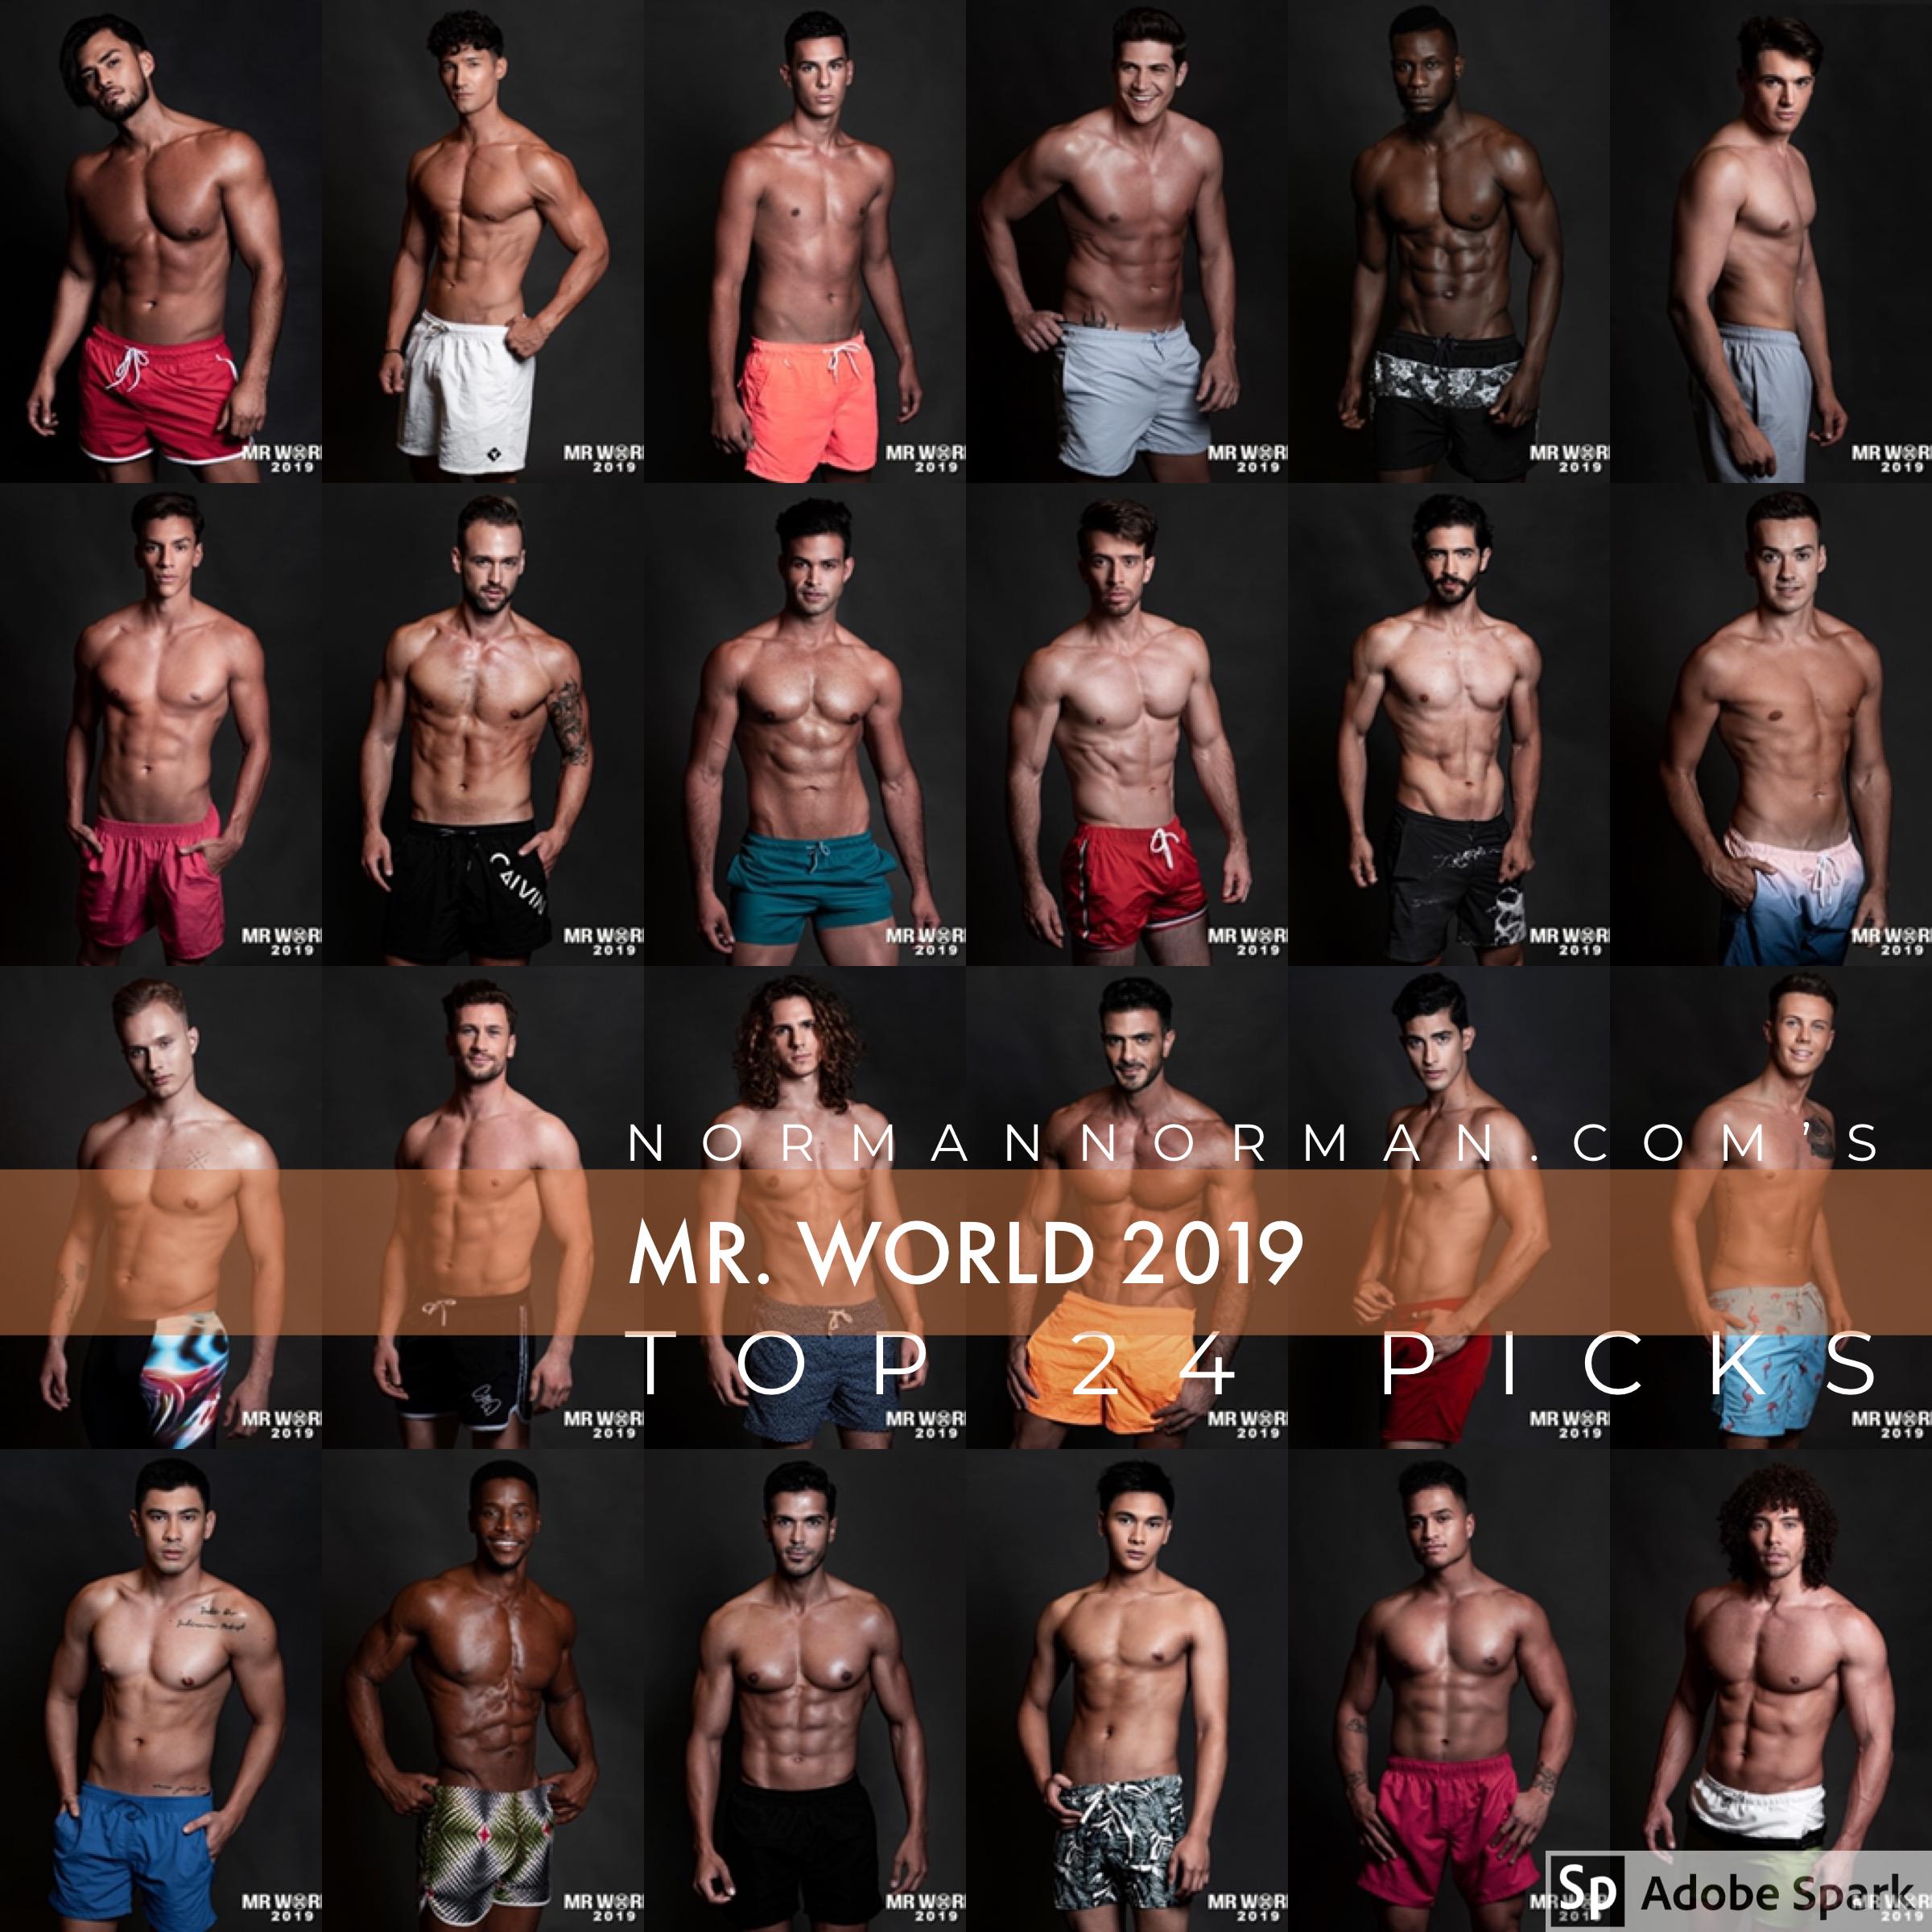 Mr world 2019